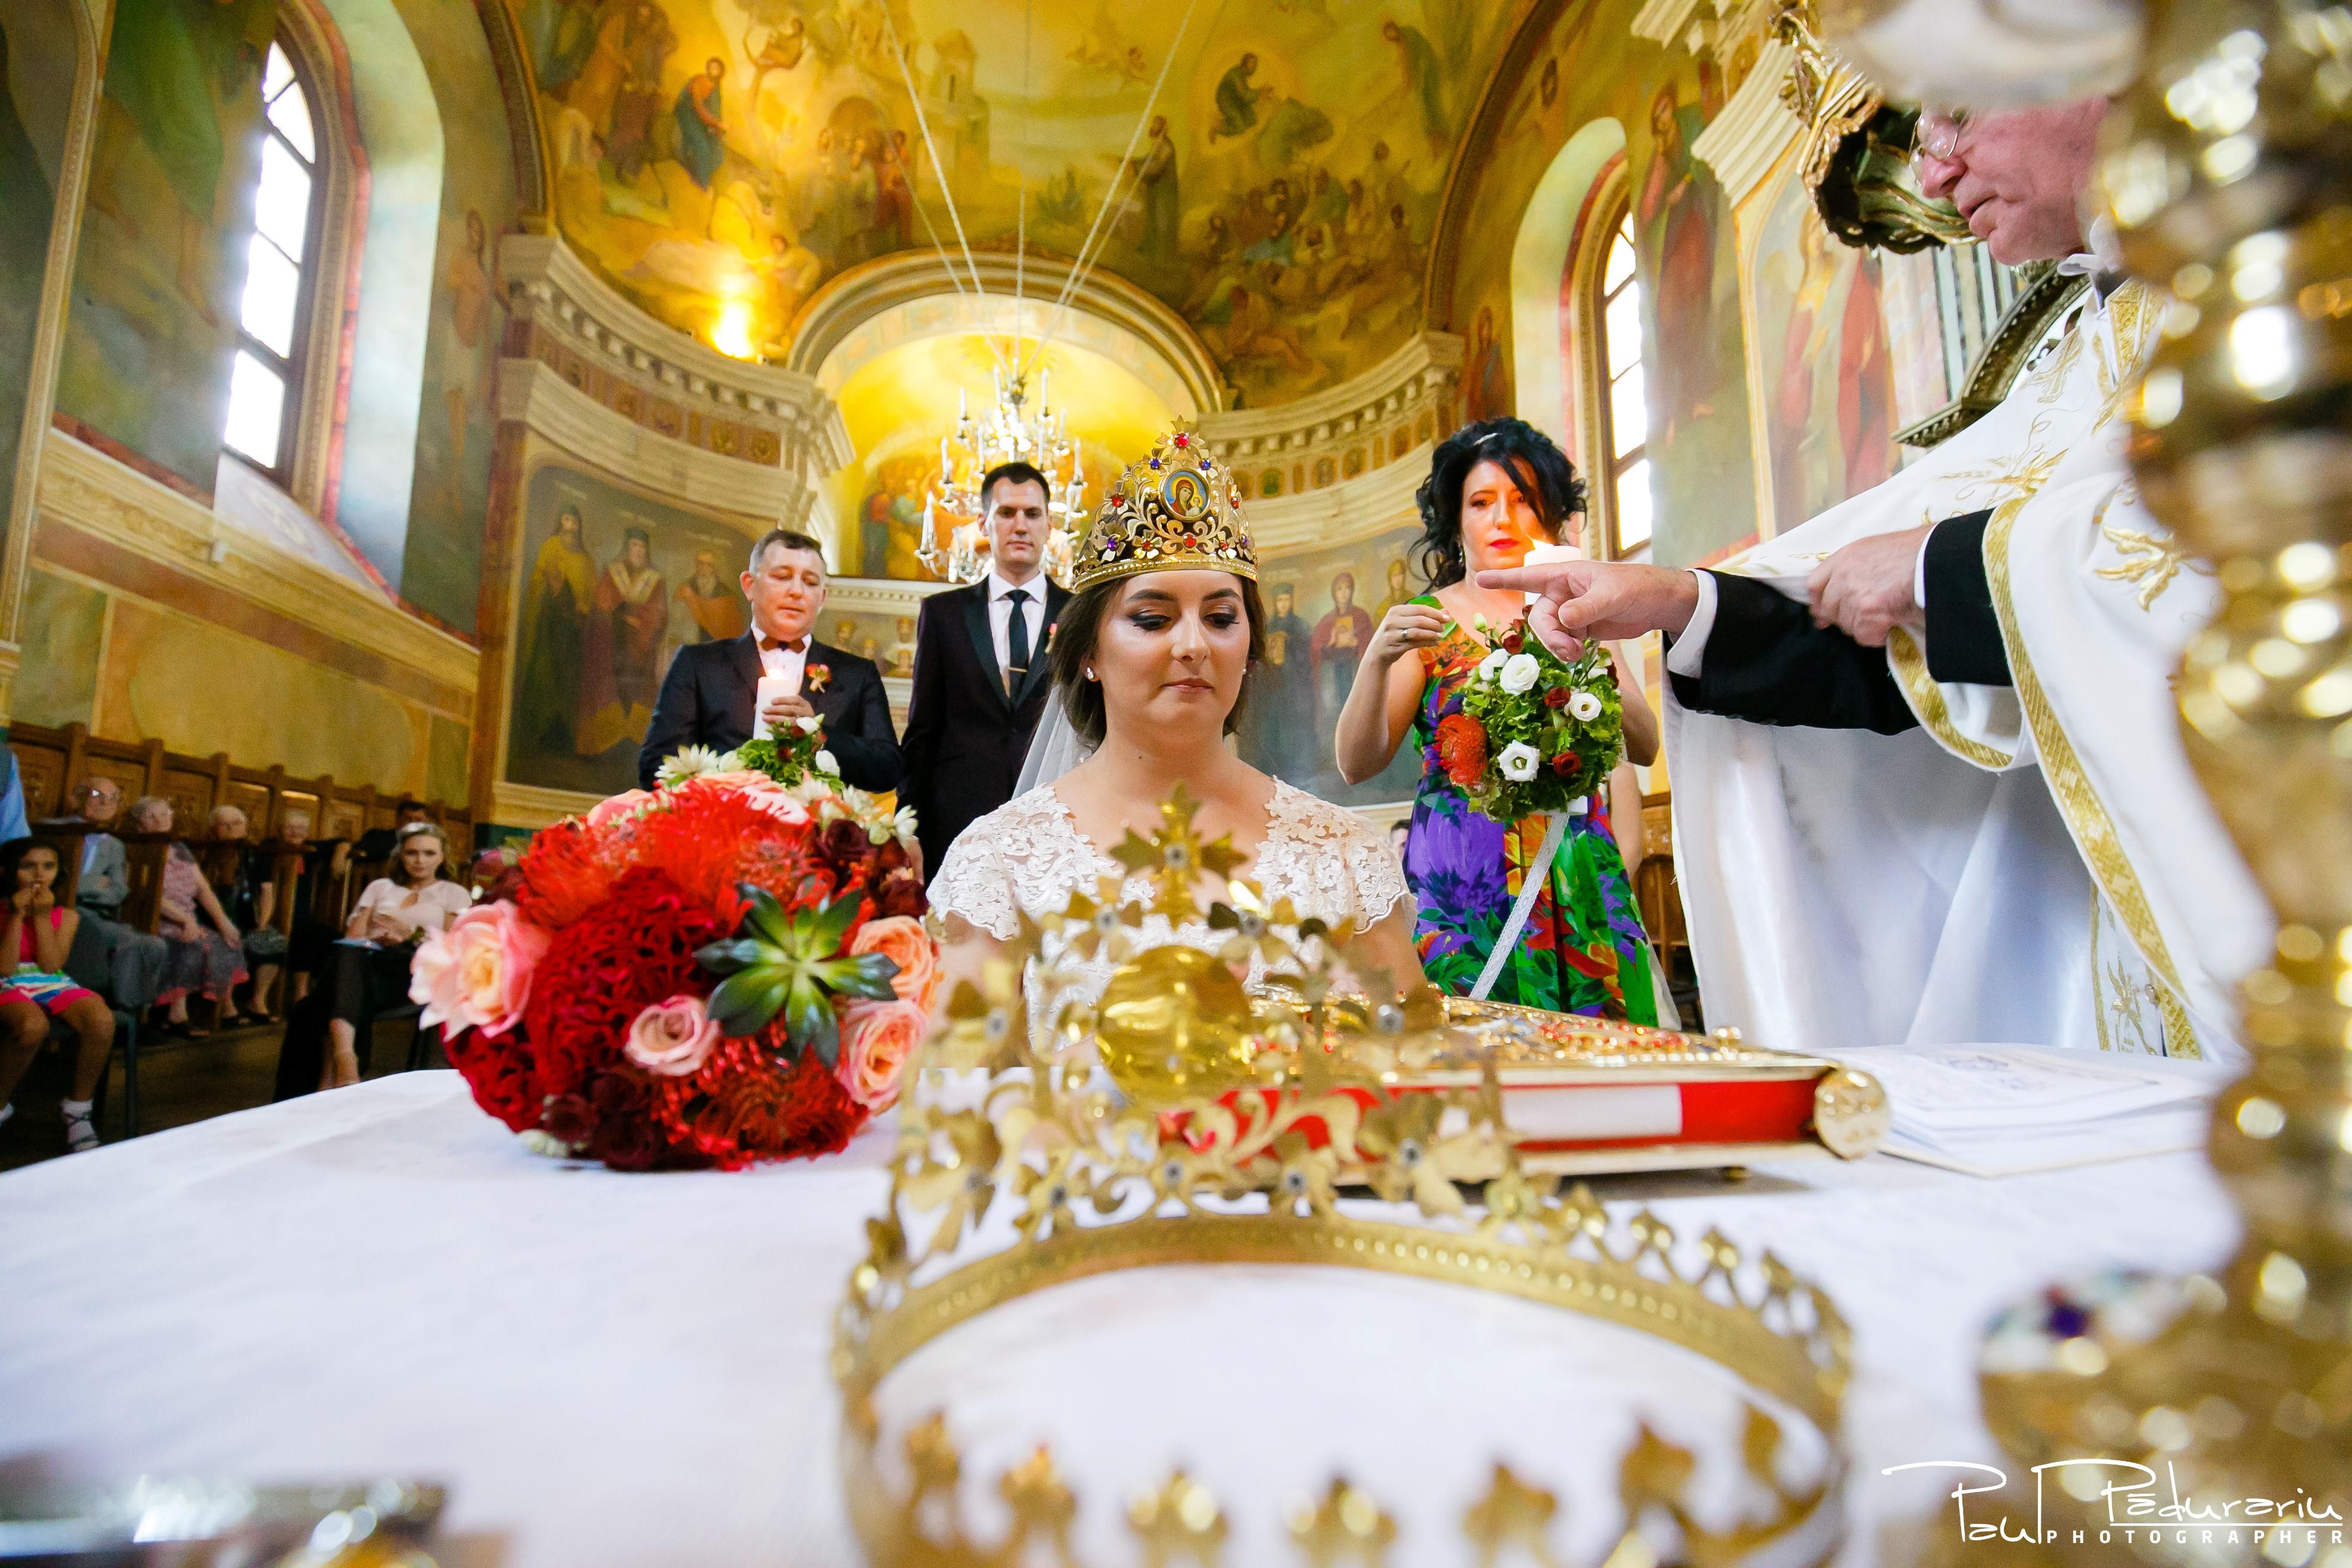 Cristina si Razvan nunta rustica la Bellaria Iasi cununia religioasa cununii miresa fotograf profesionist nunta www.paulpadurariu.ro © 2017 Paul Padurariu